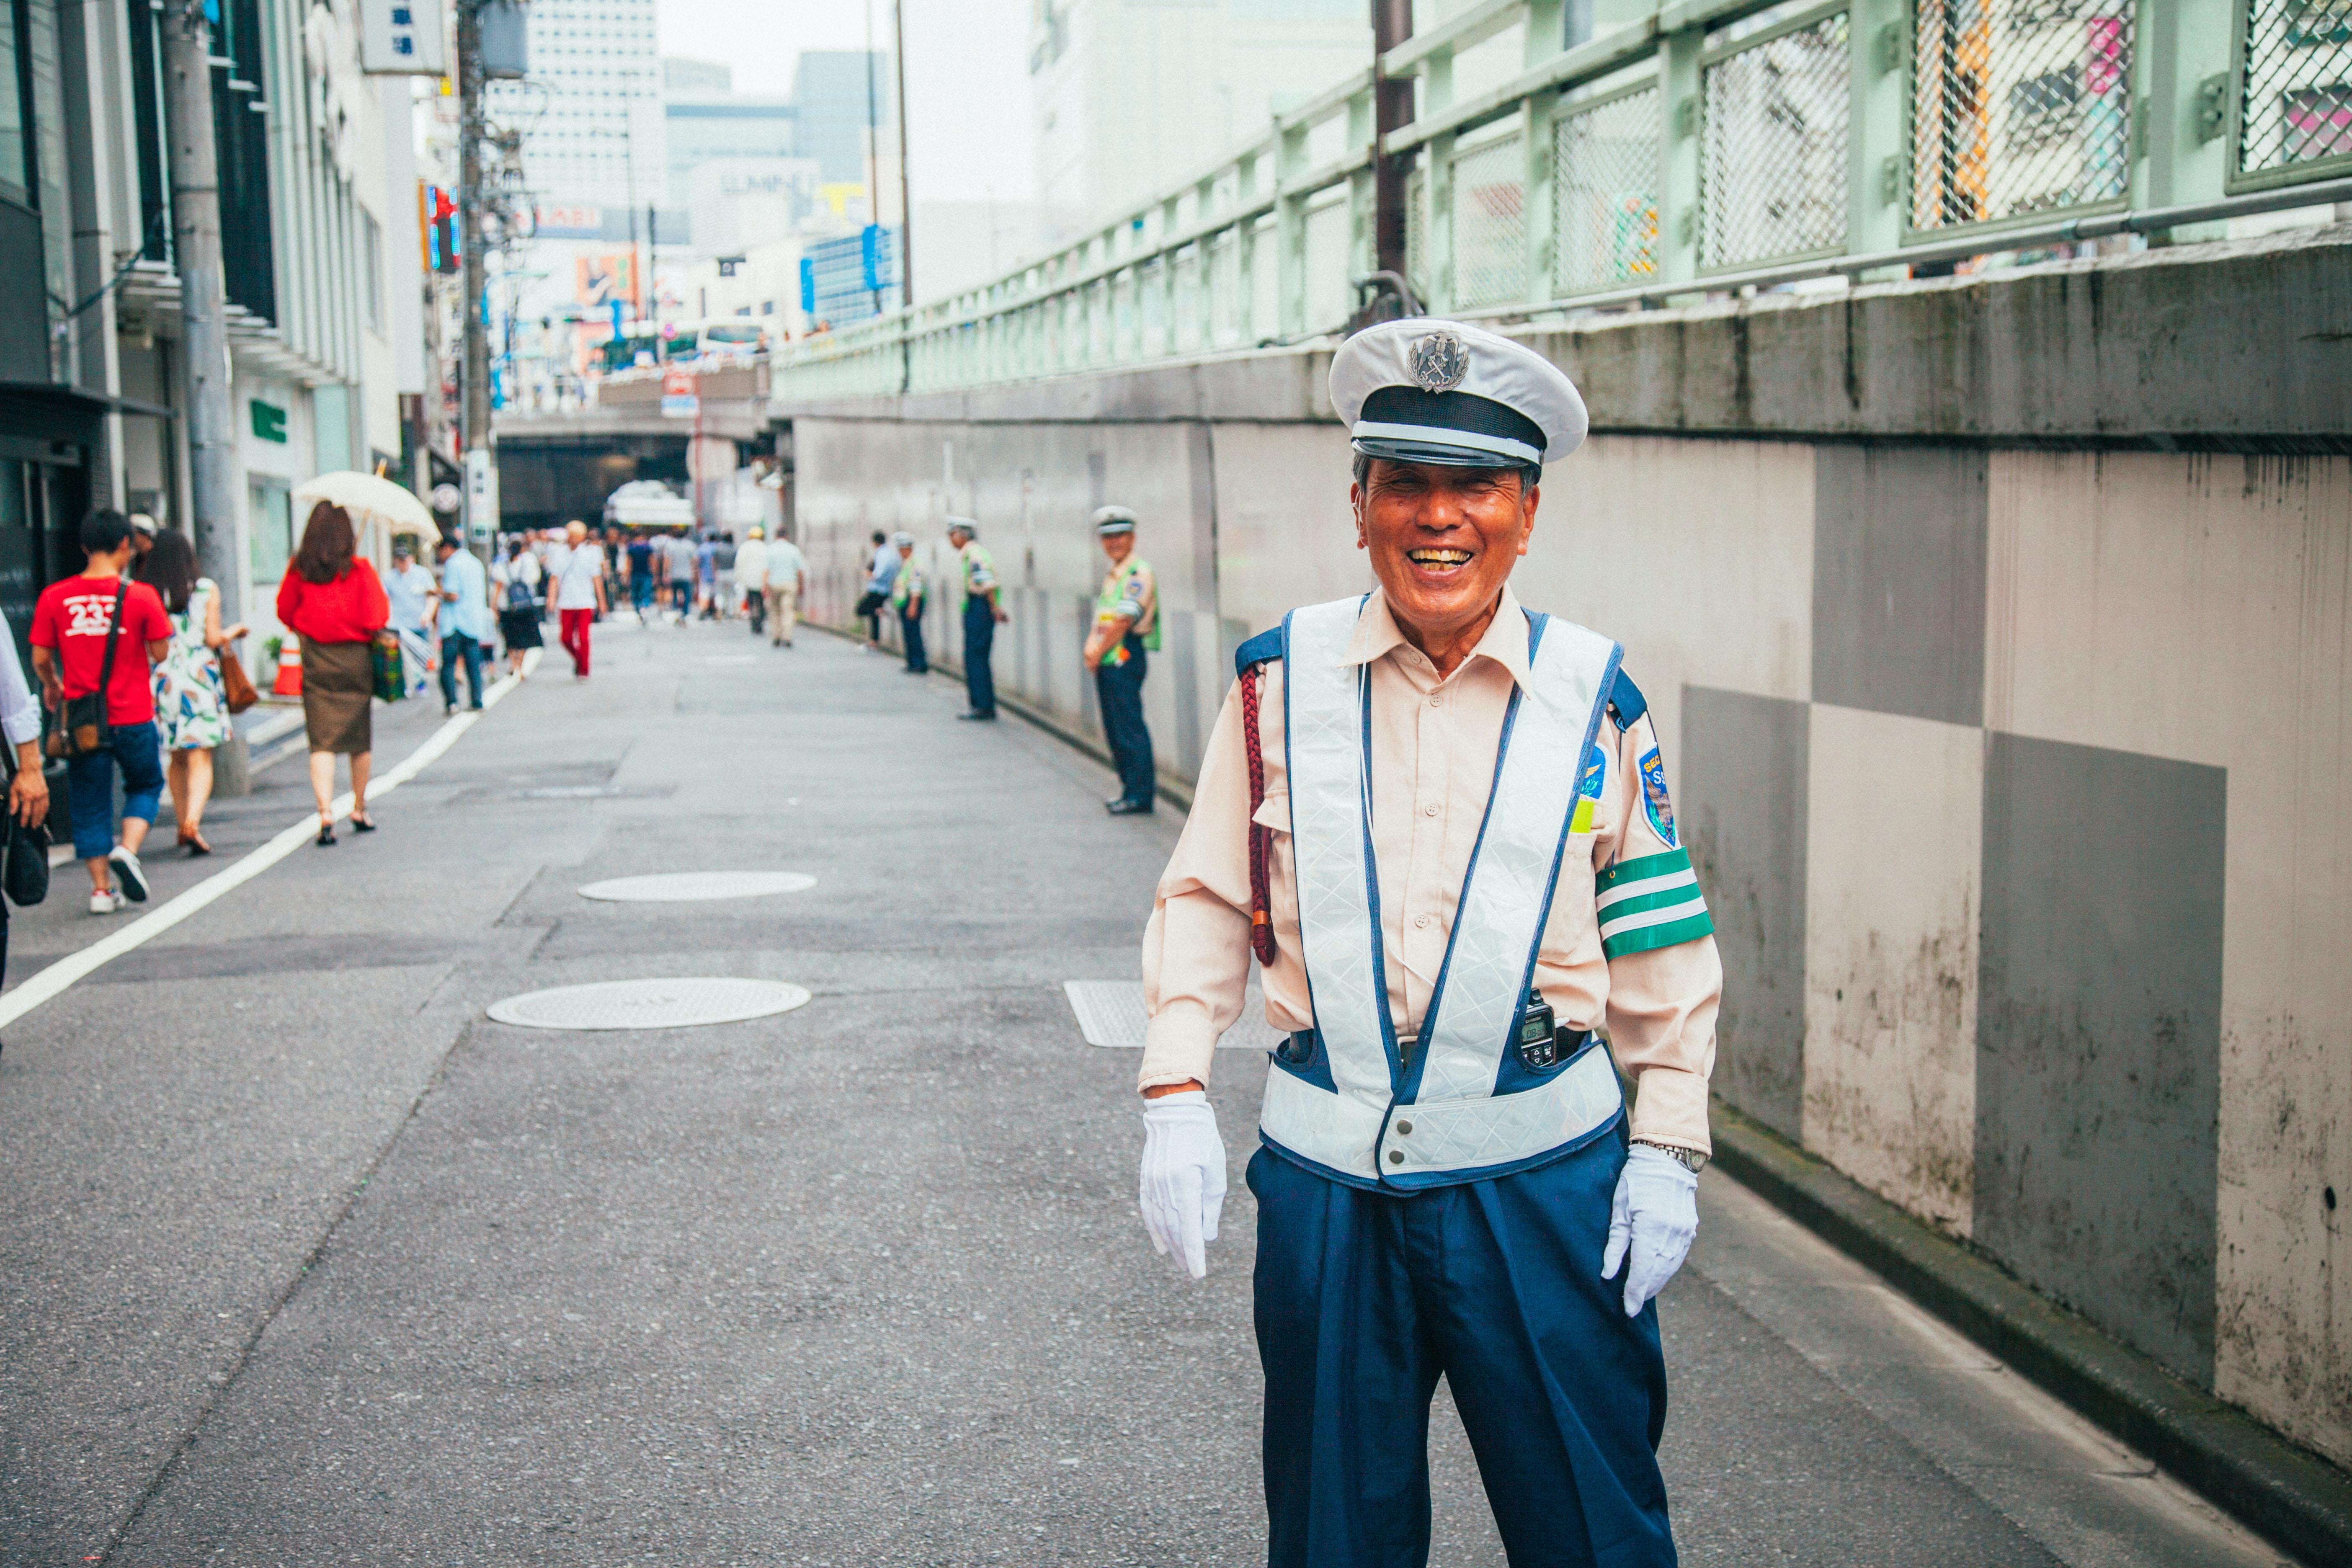 A smiling traffic cop on the street in Shinjuku Japan